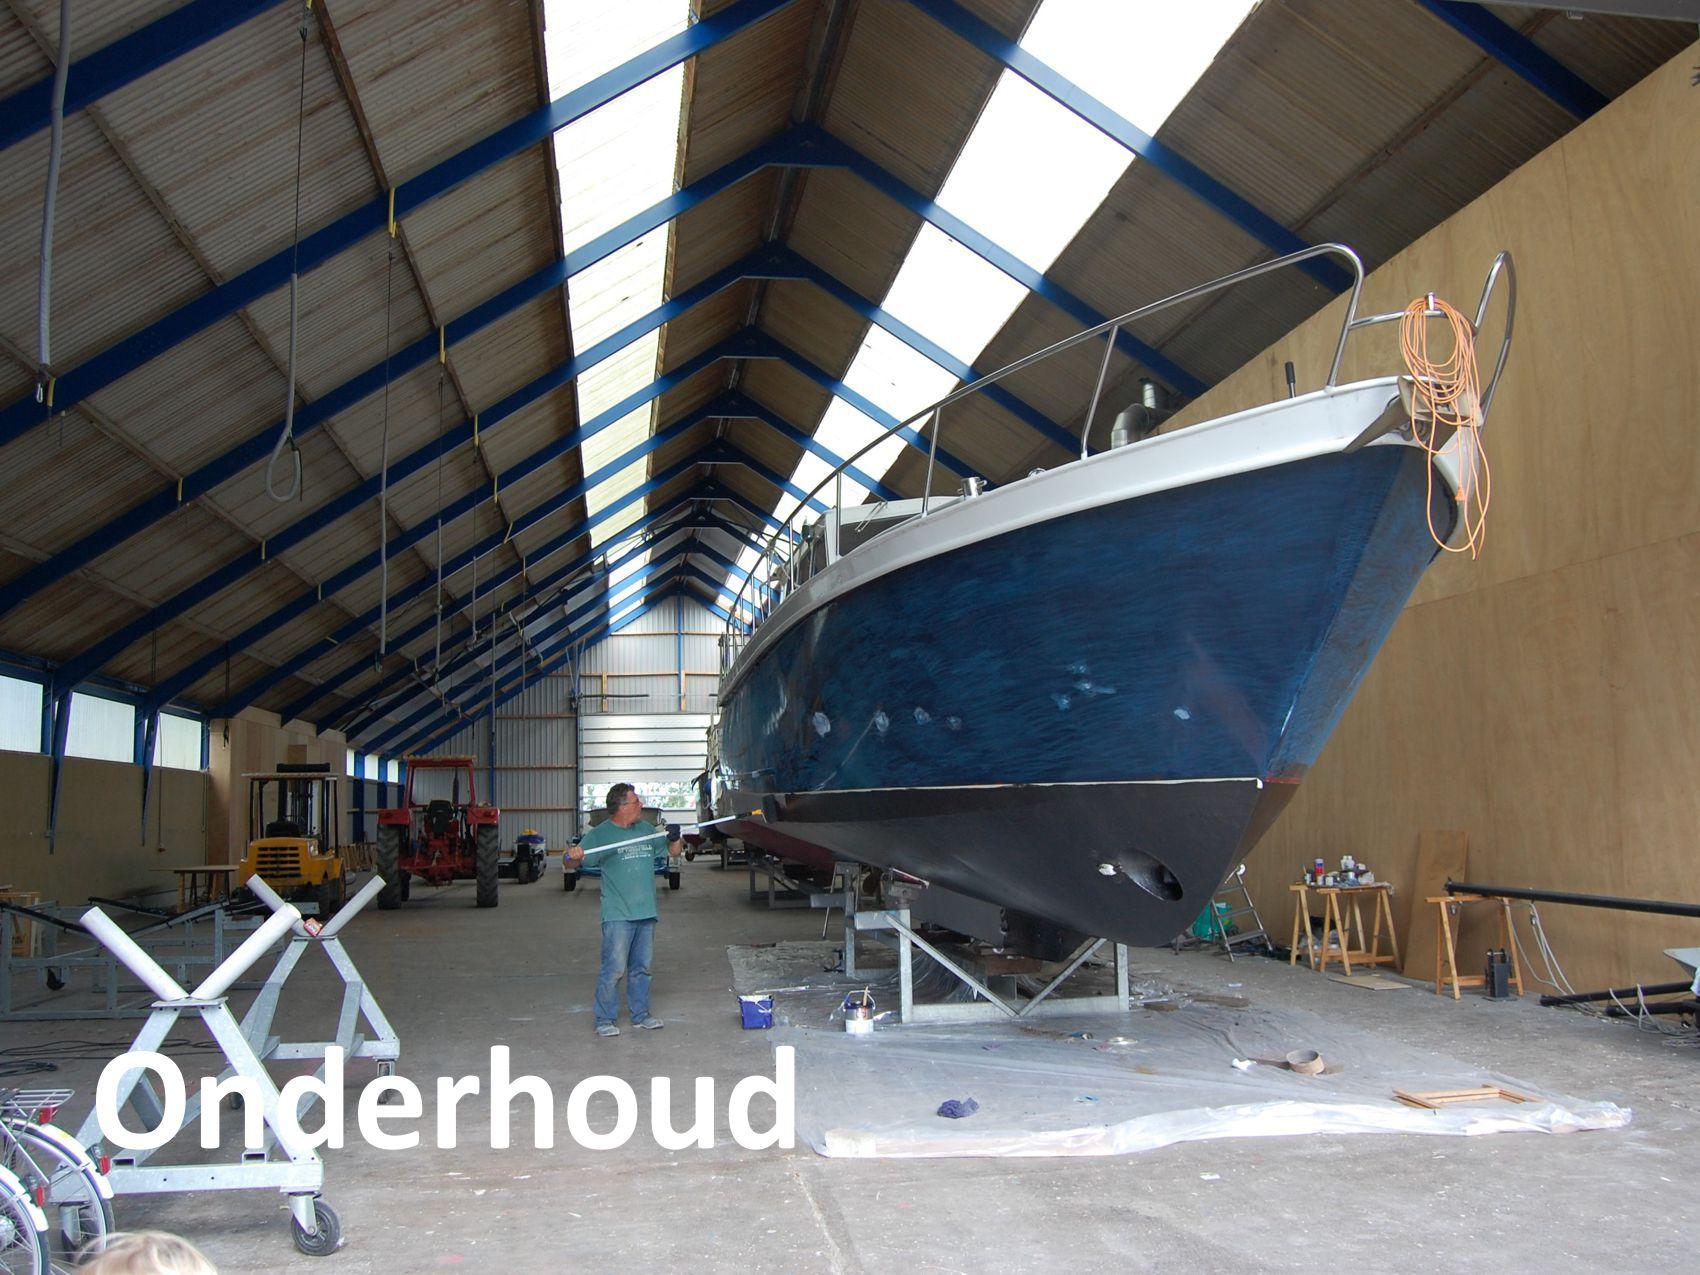 Onderhoud_Klussen_Stalling_Jachthaven_de_Watervriend_Friesland